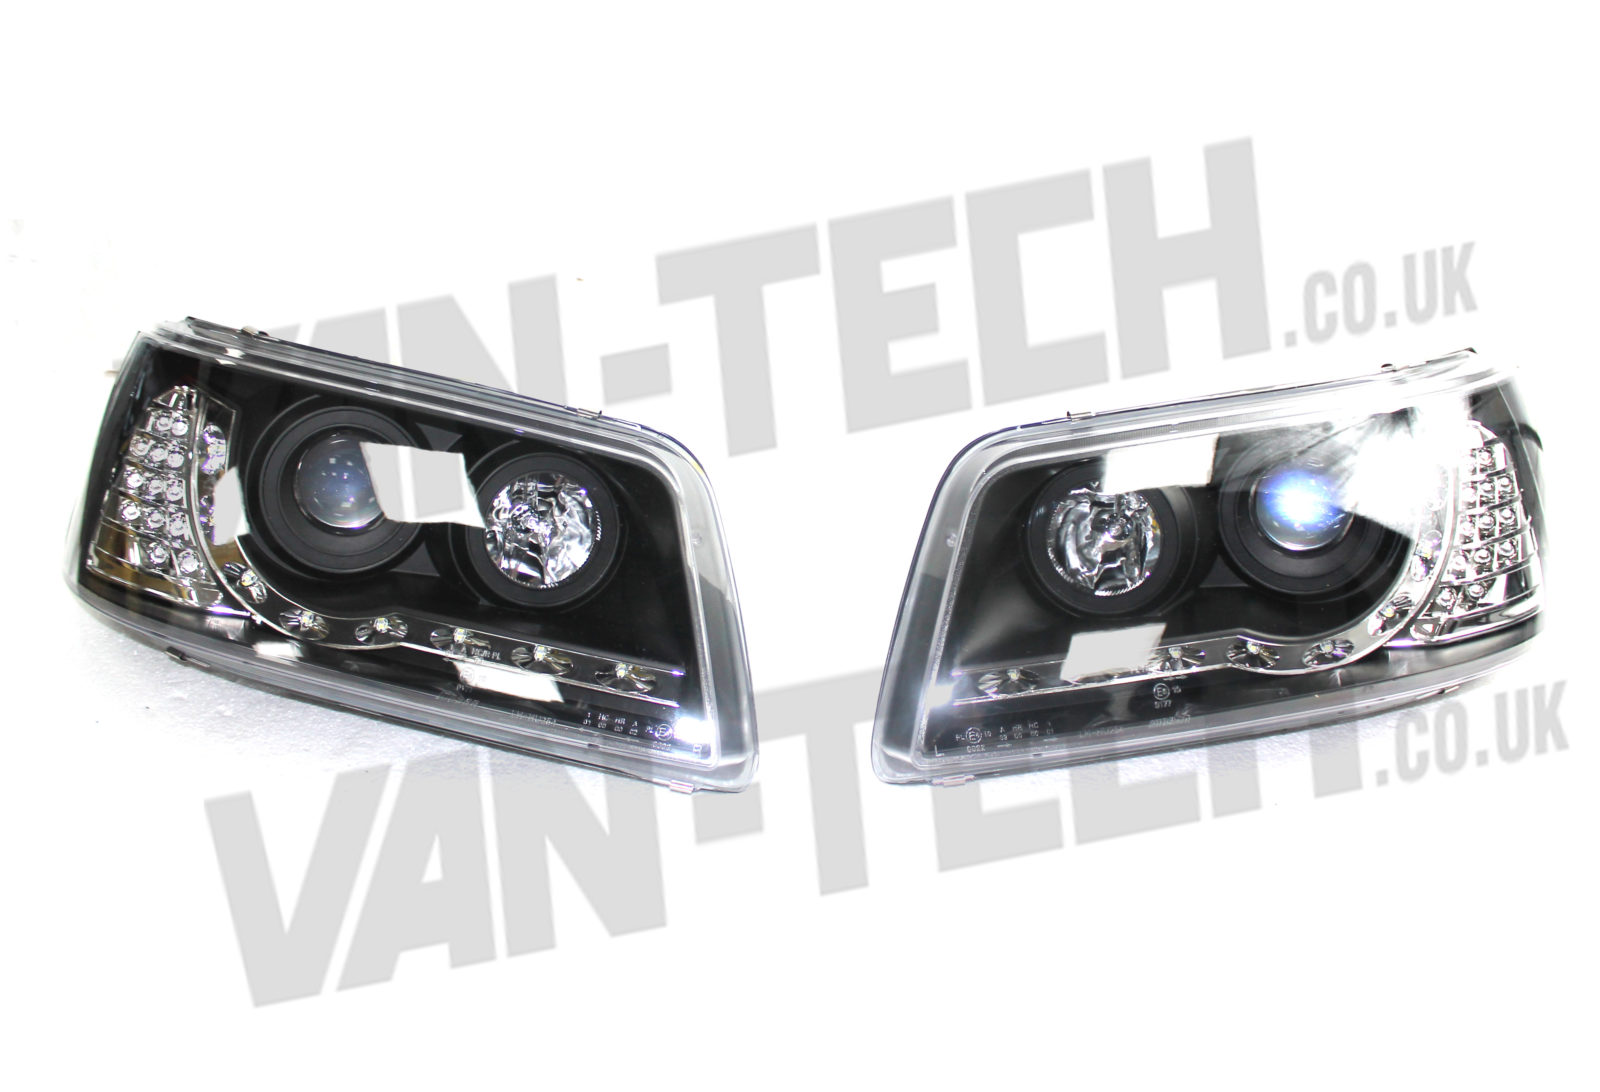 Vw T5 Headlights Drl Audi Style Led Indicator 2003 2010